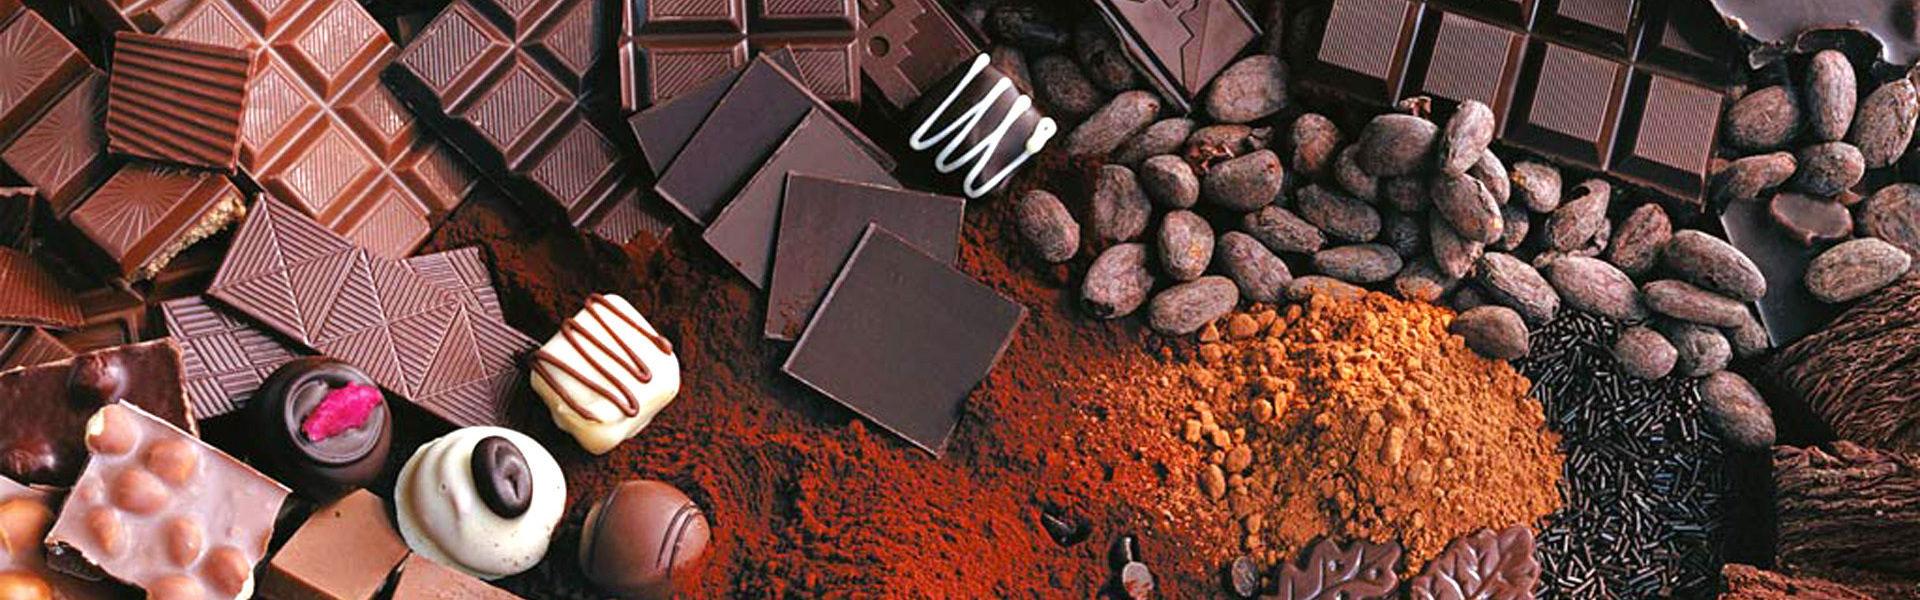 stampi policarbonato cioccolato